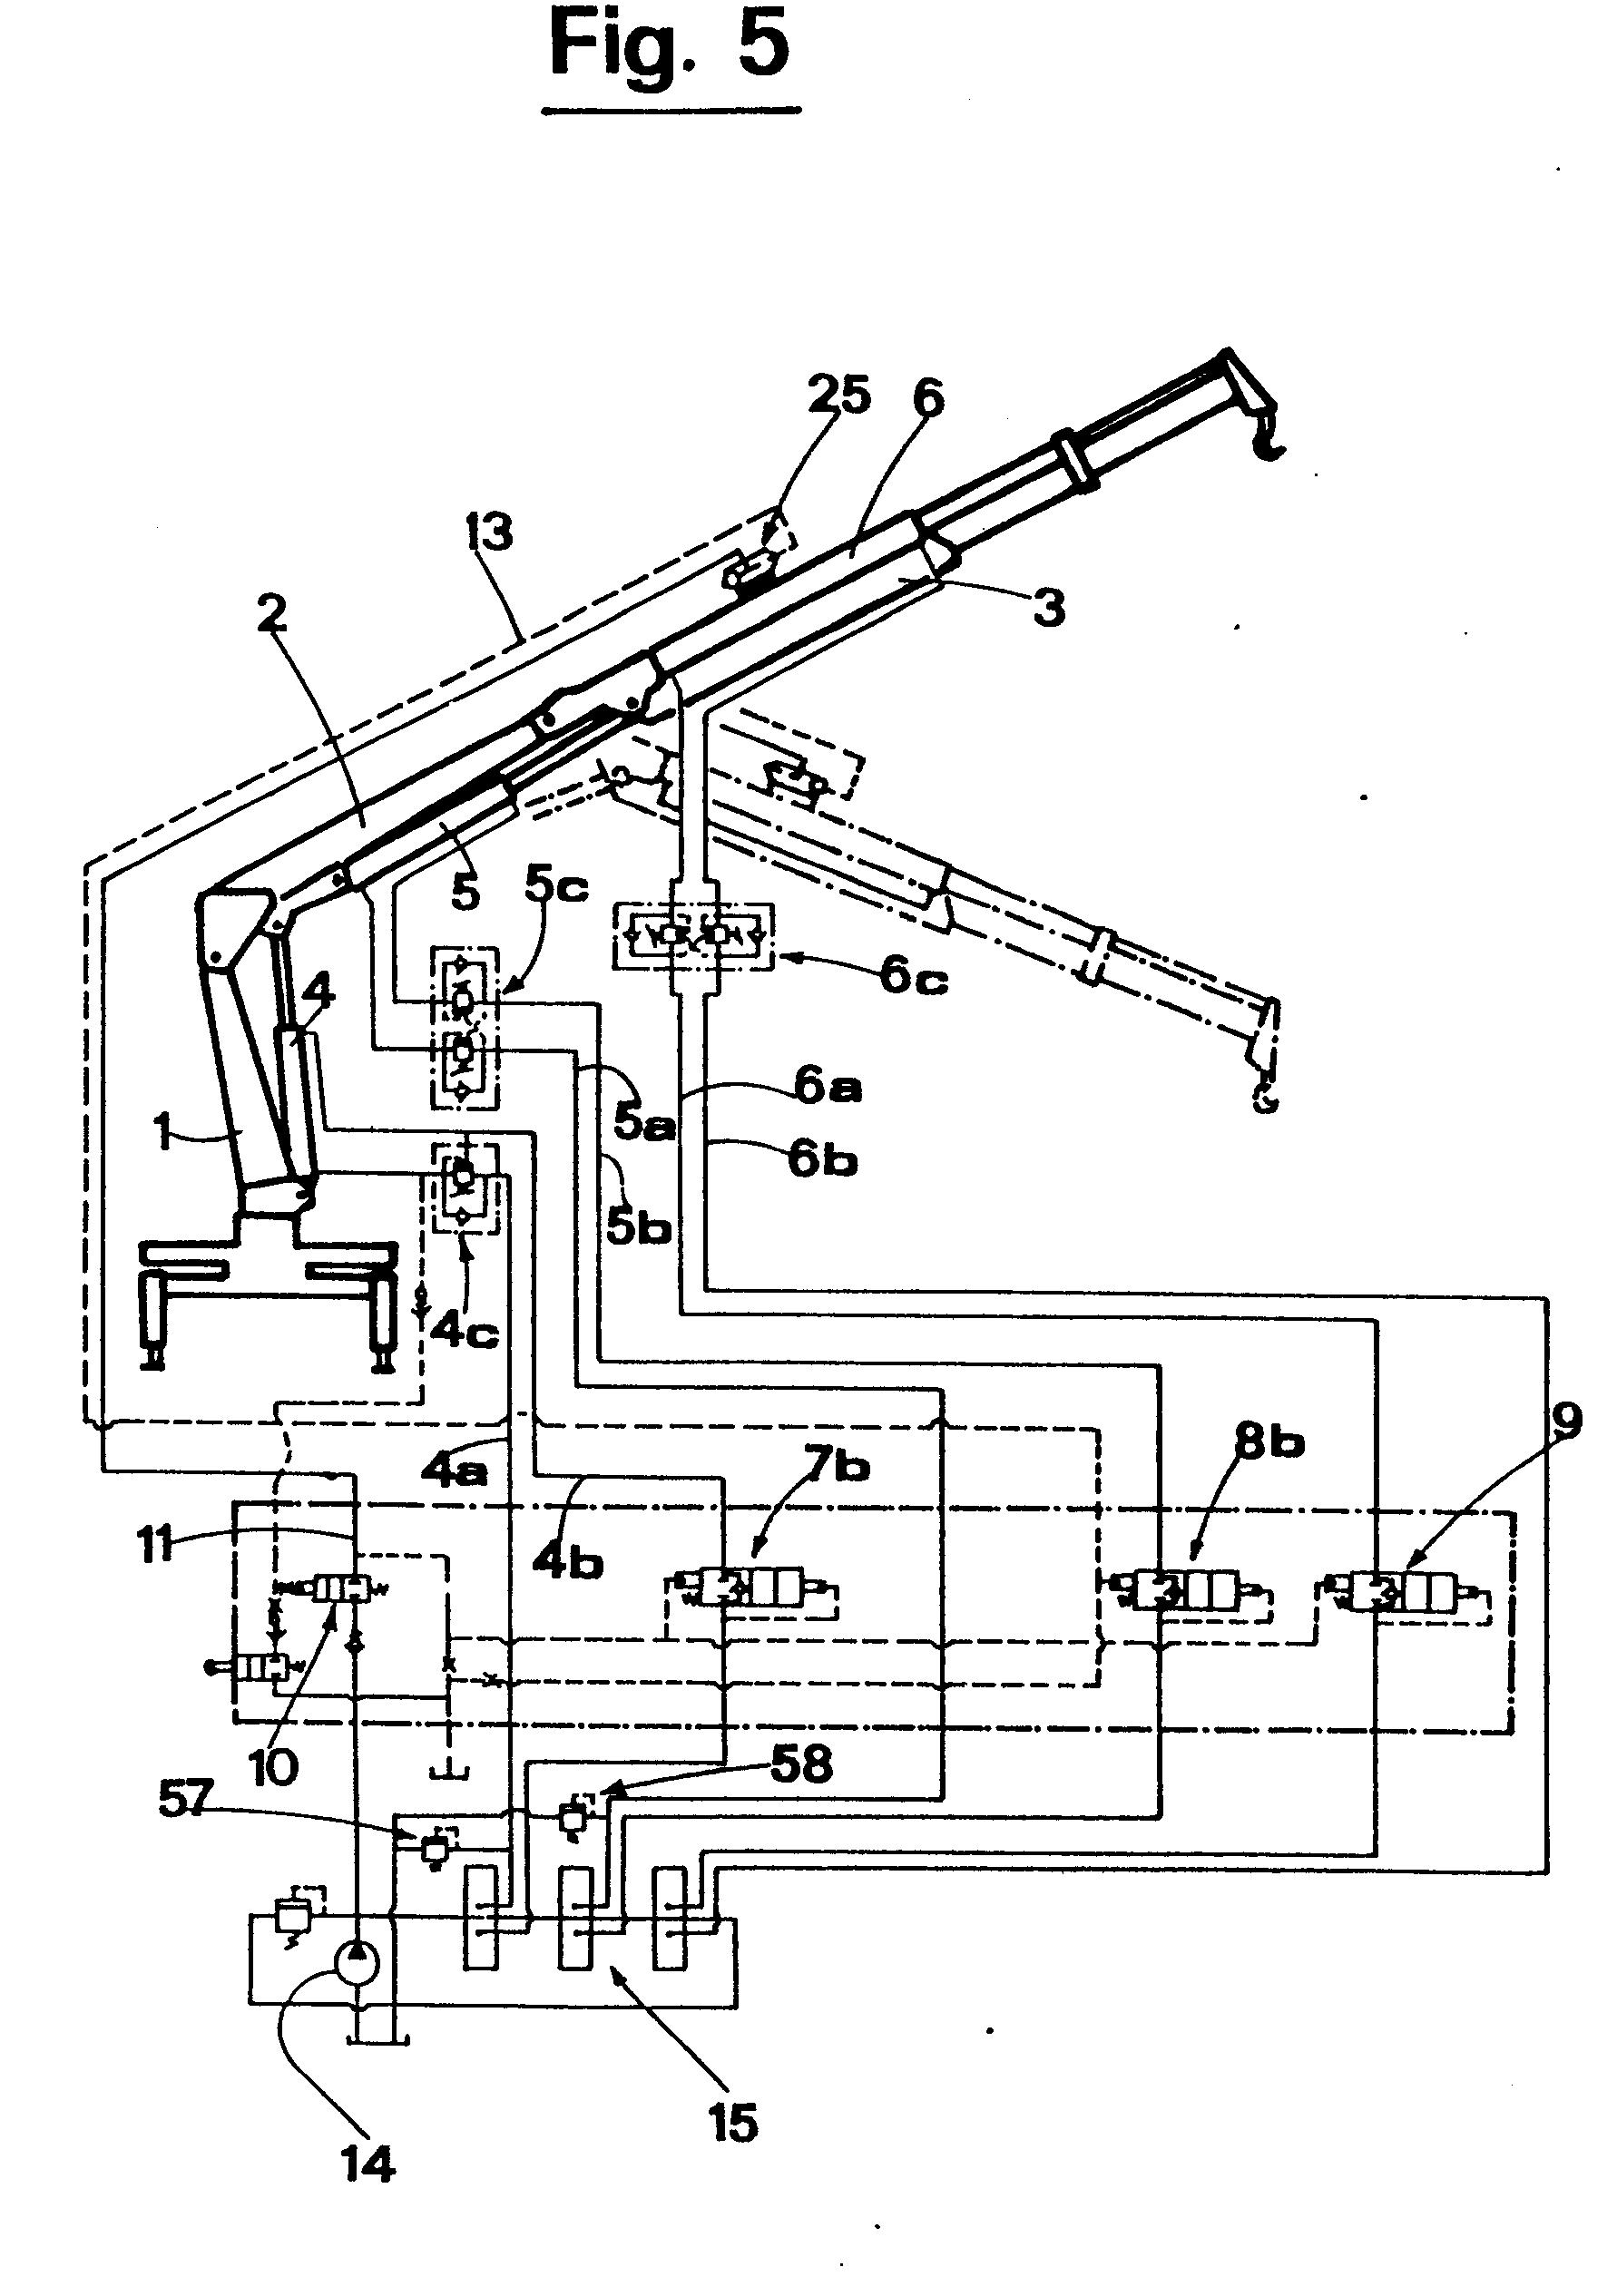 hight resolution of mobile crane electrical diagram national crane wiring diagram diagrams